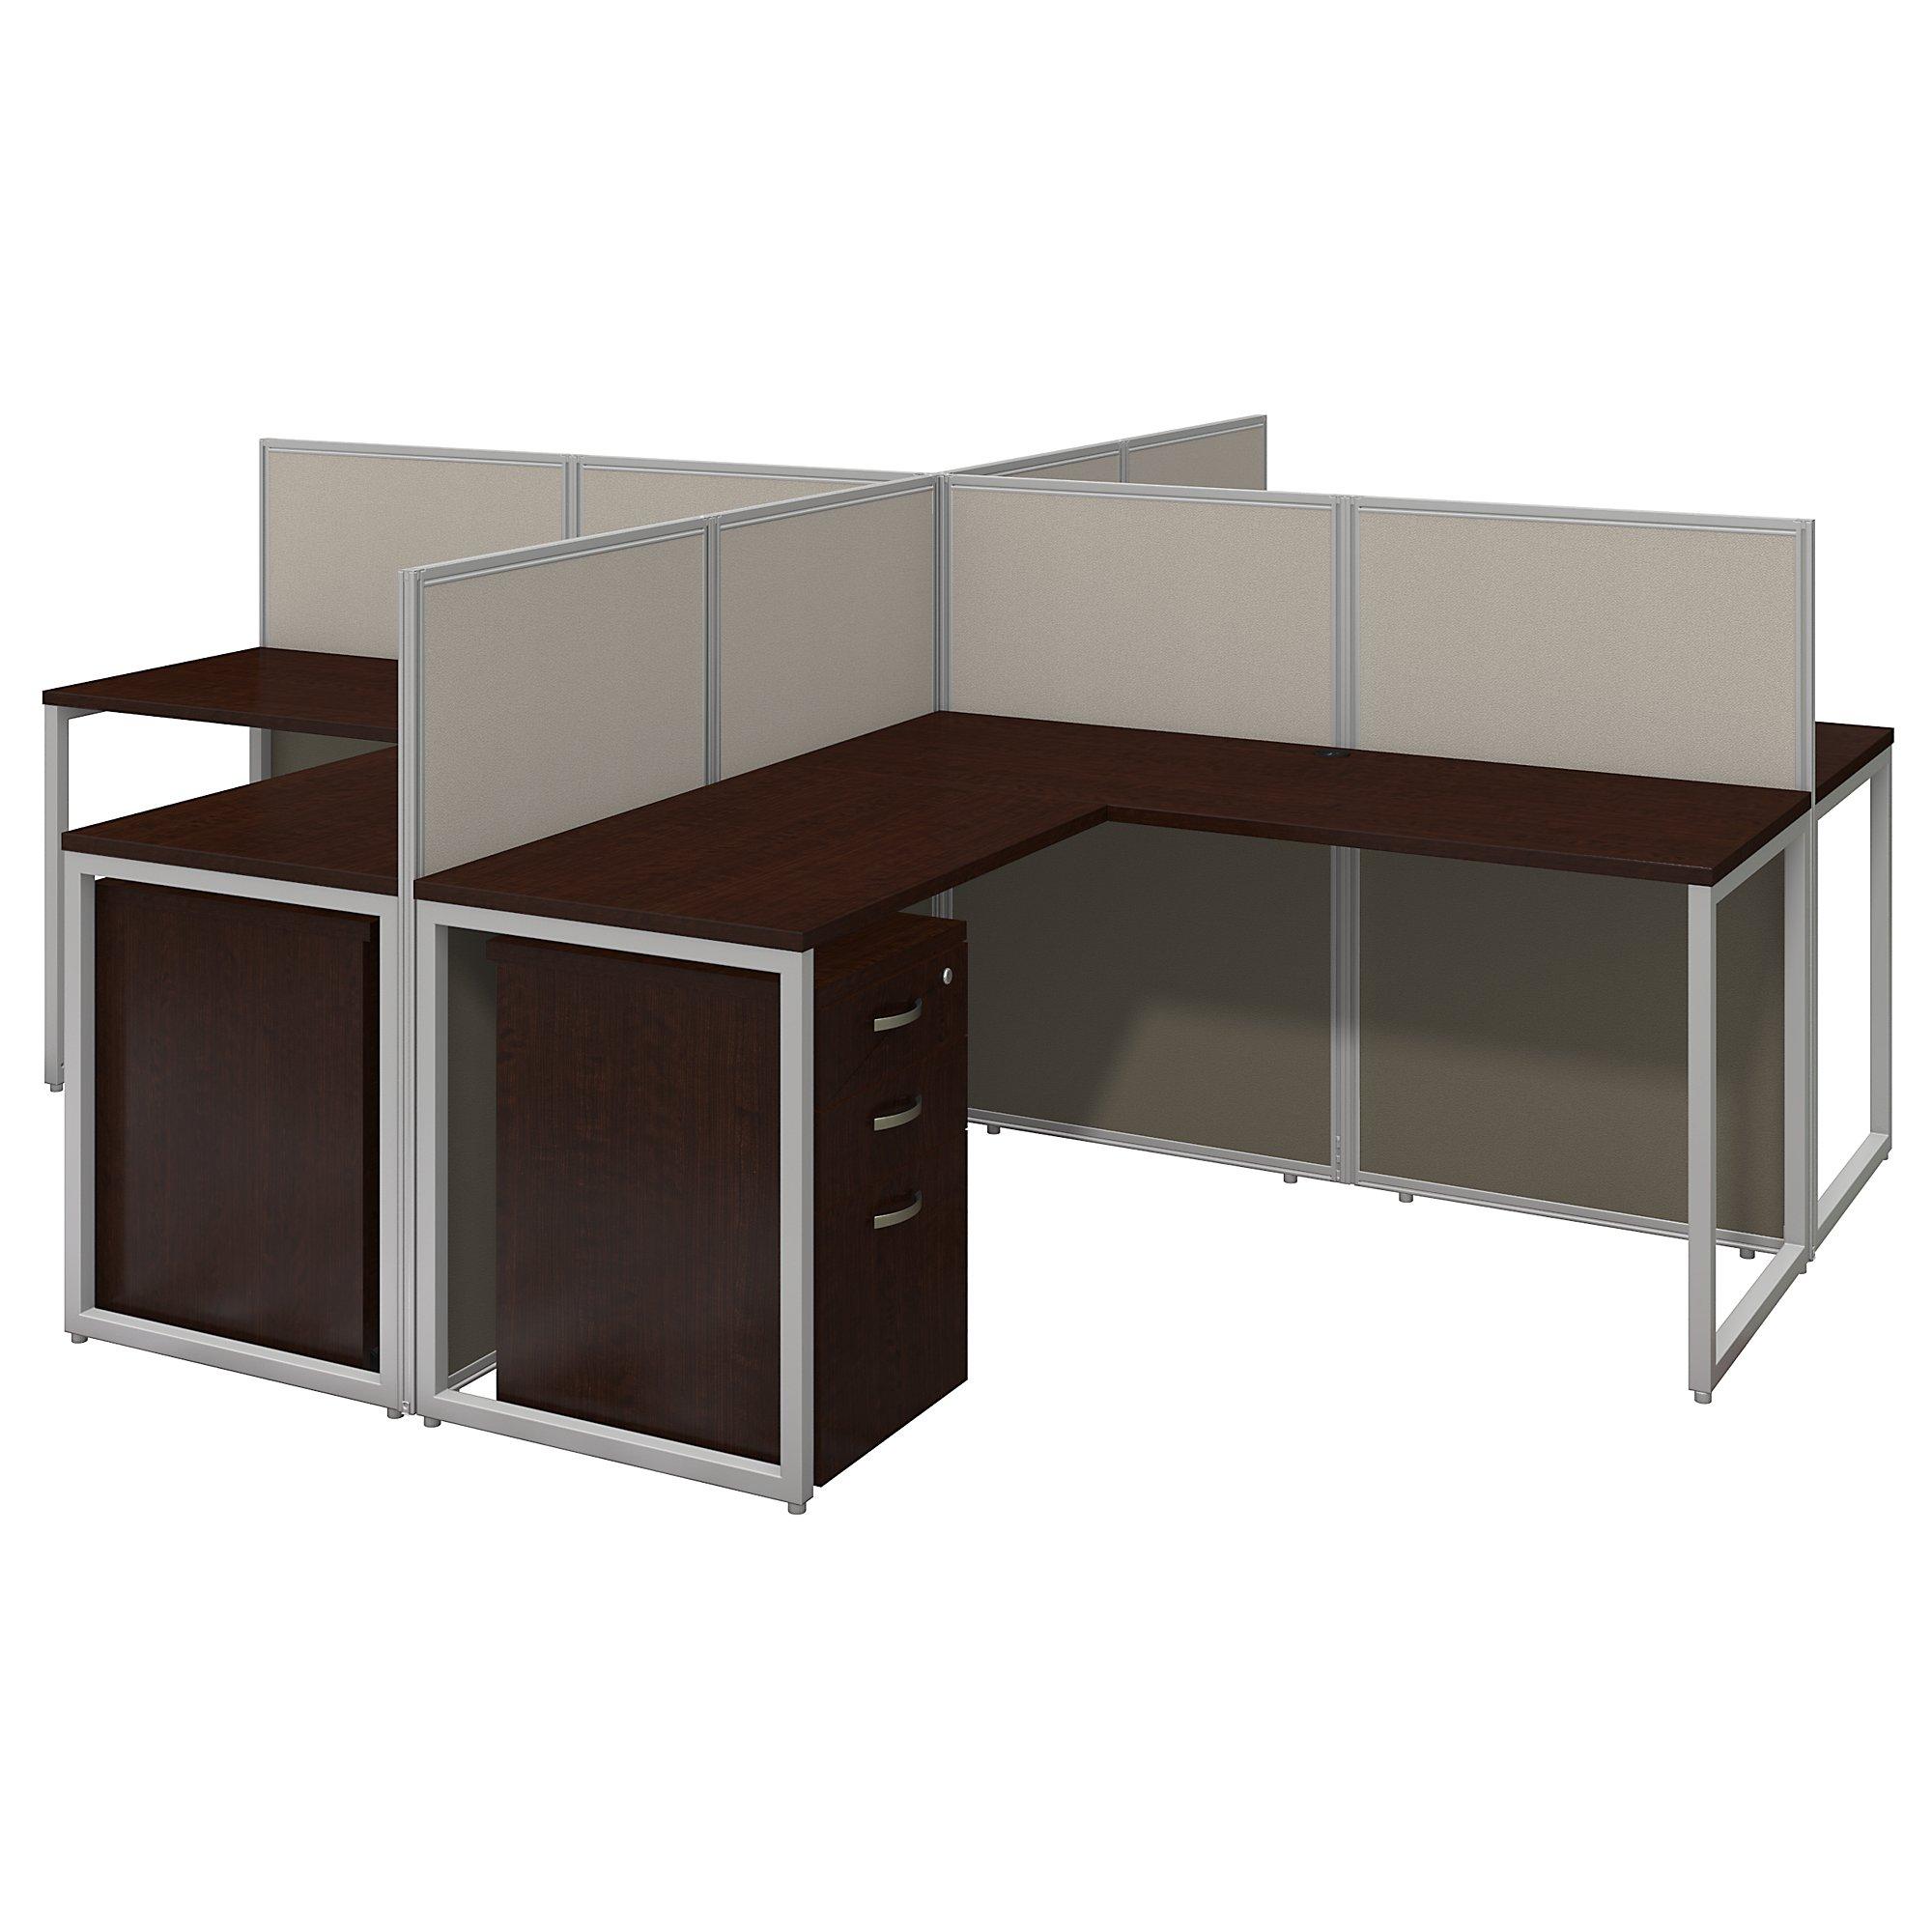 4 person modular cubicle workstation